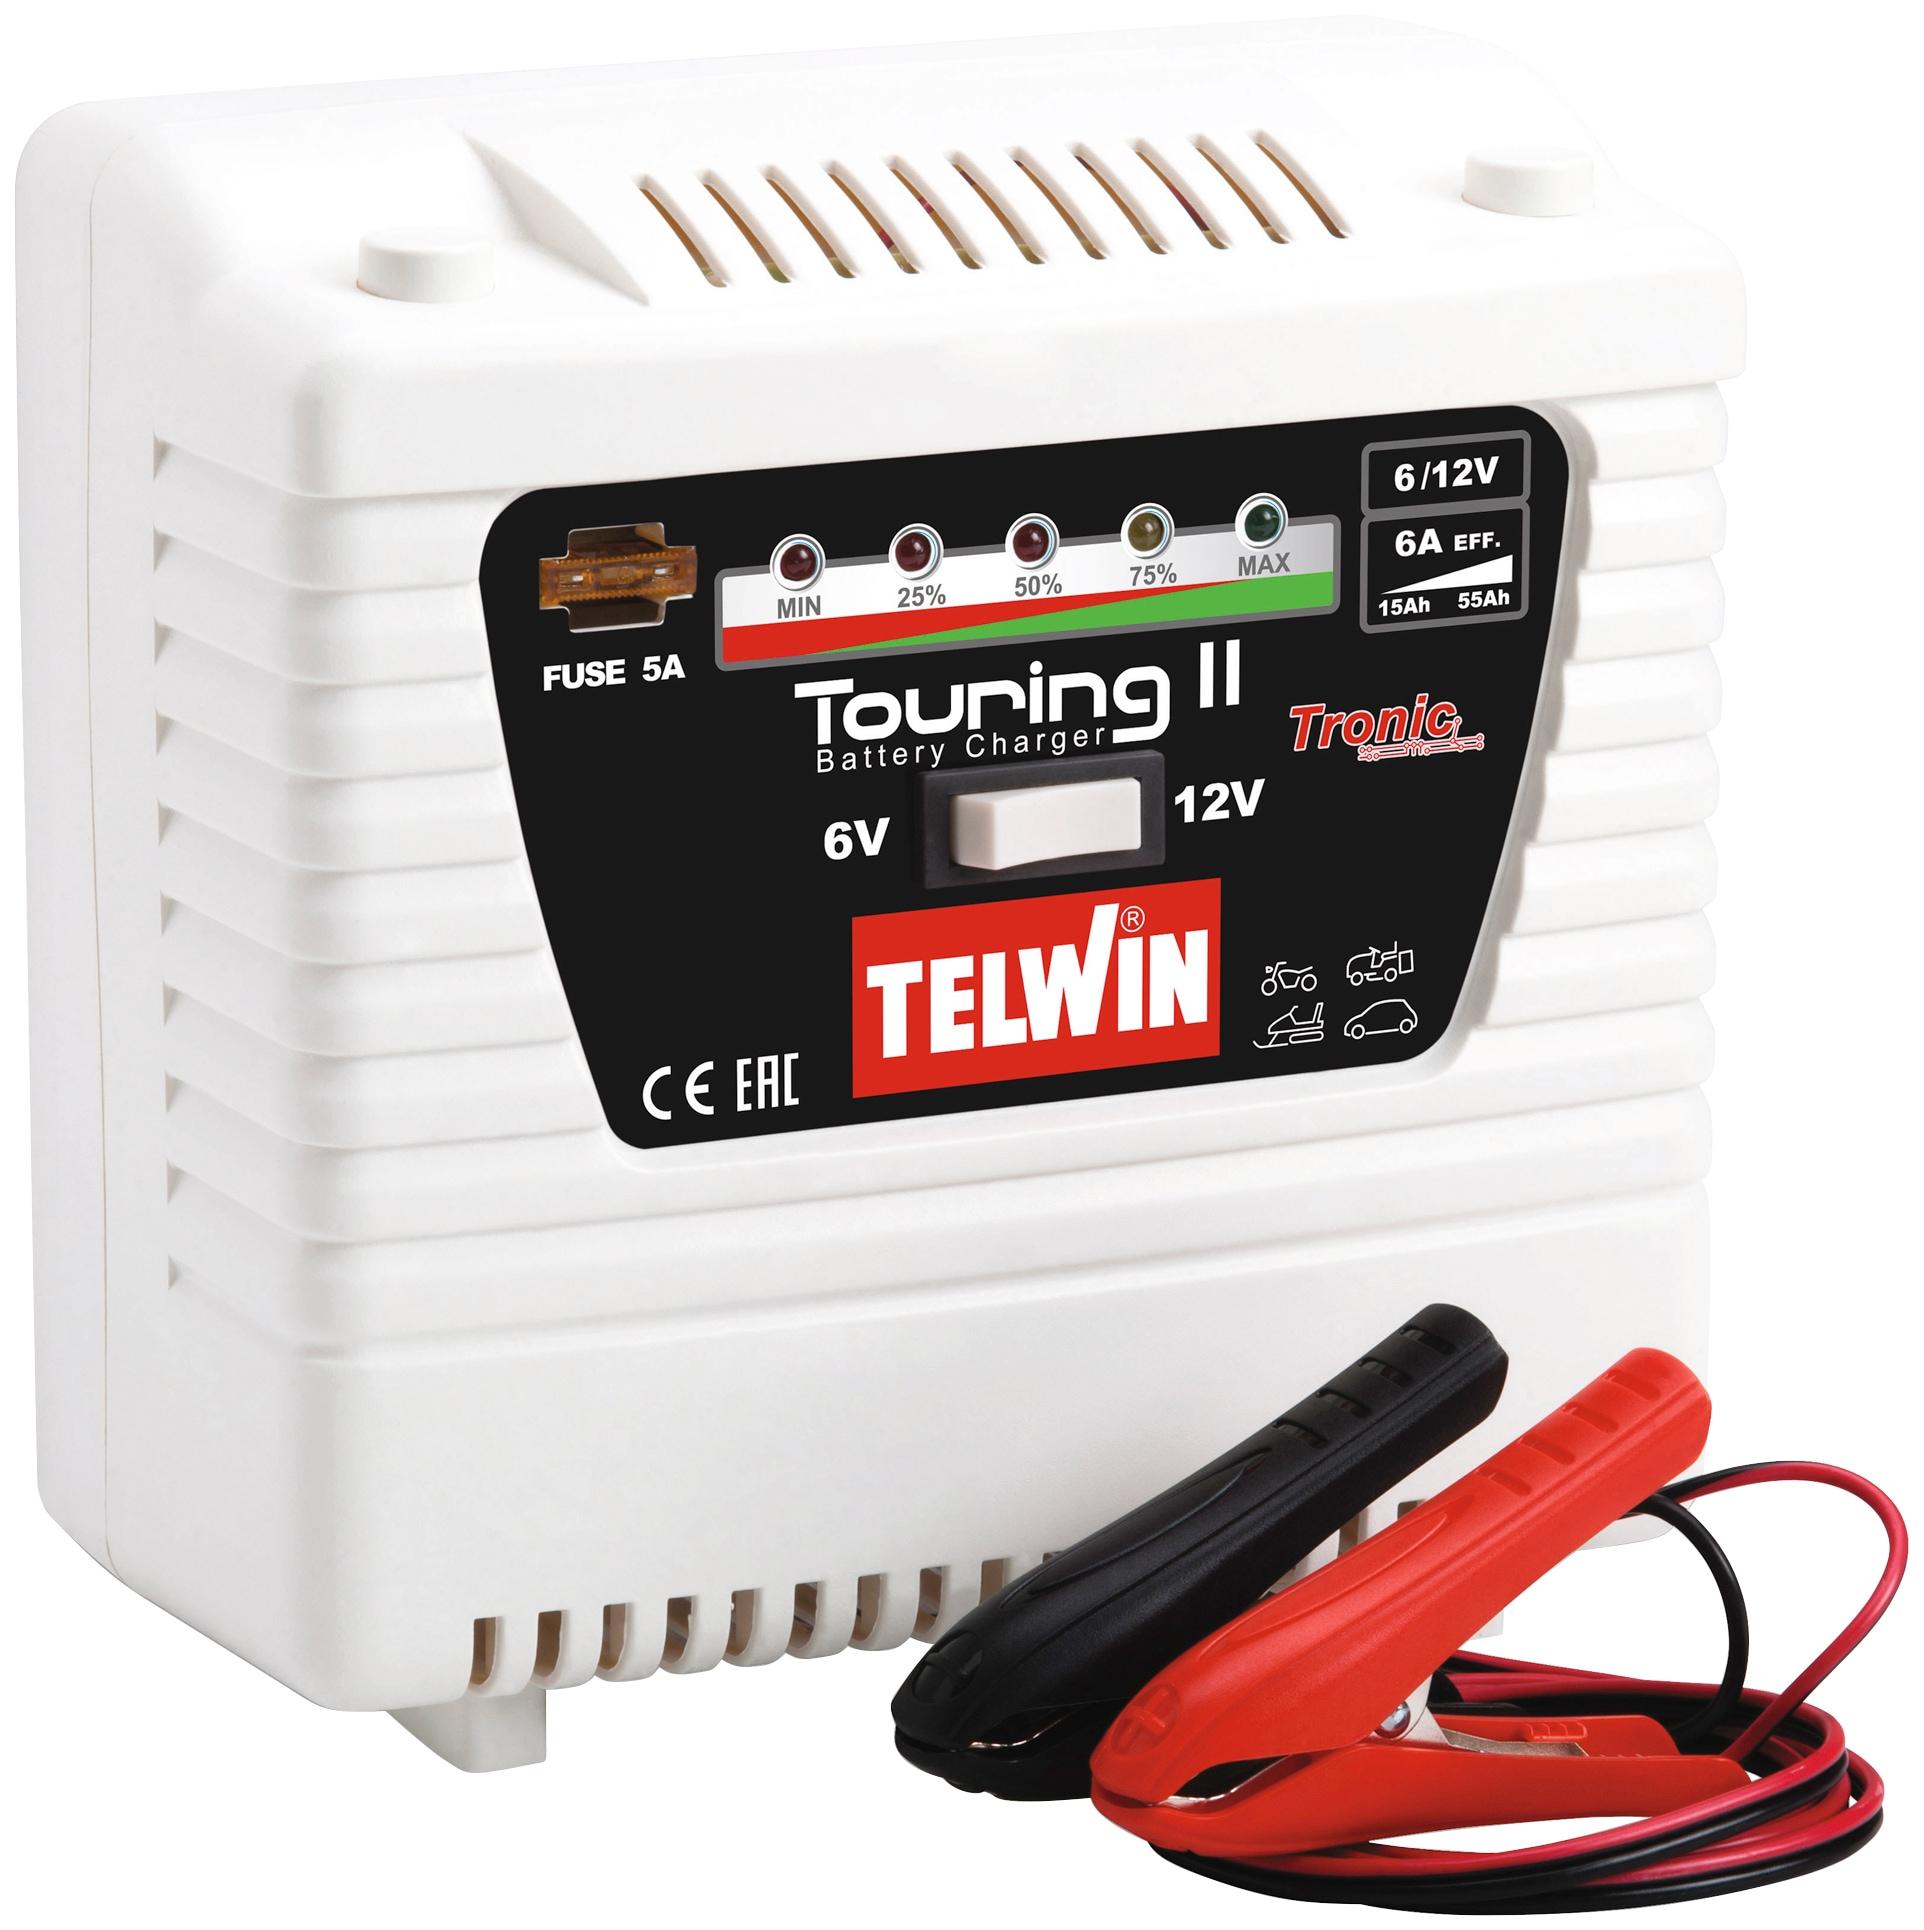 TELWIN Autobatterie-Ladegerät Touring 11, 2000 mA, 6/12 V weiß Autobatterie-Ladegeräte Autozubehör Reifen